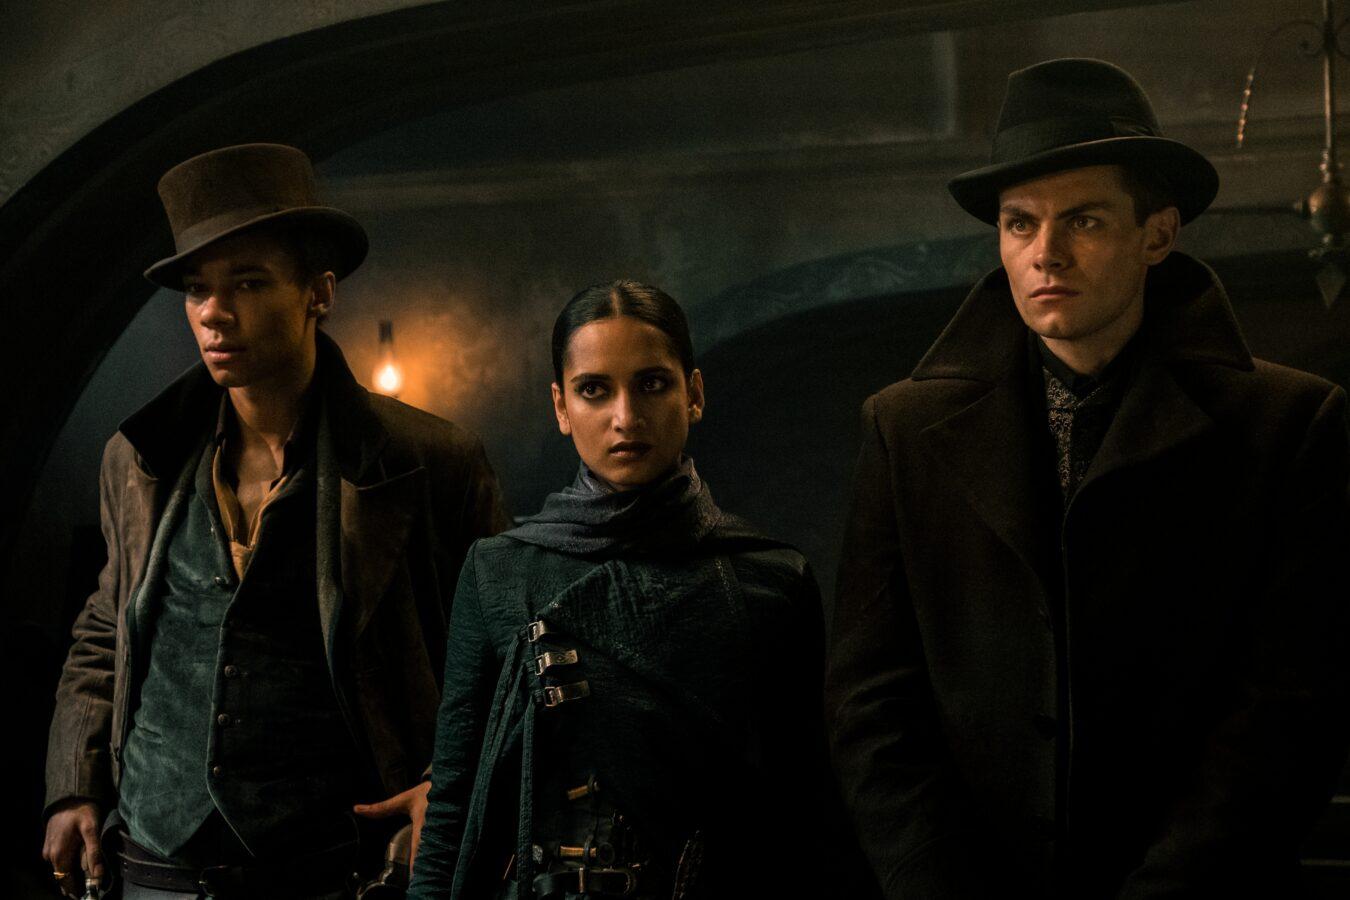 [L to R] Kit Young as Jesper Fahey, Amita Suman as Inej Ghafa, and Freddy Carter as Kaz Brekker of Shadow and Bone. Credit: David Appleby. Courtesy of Netflix.